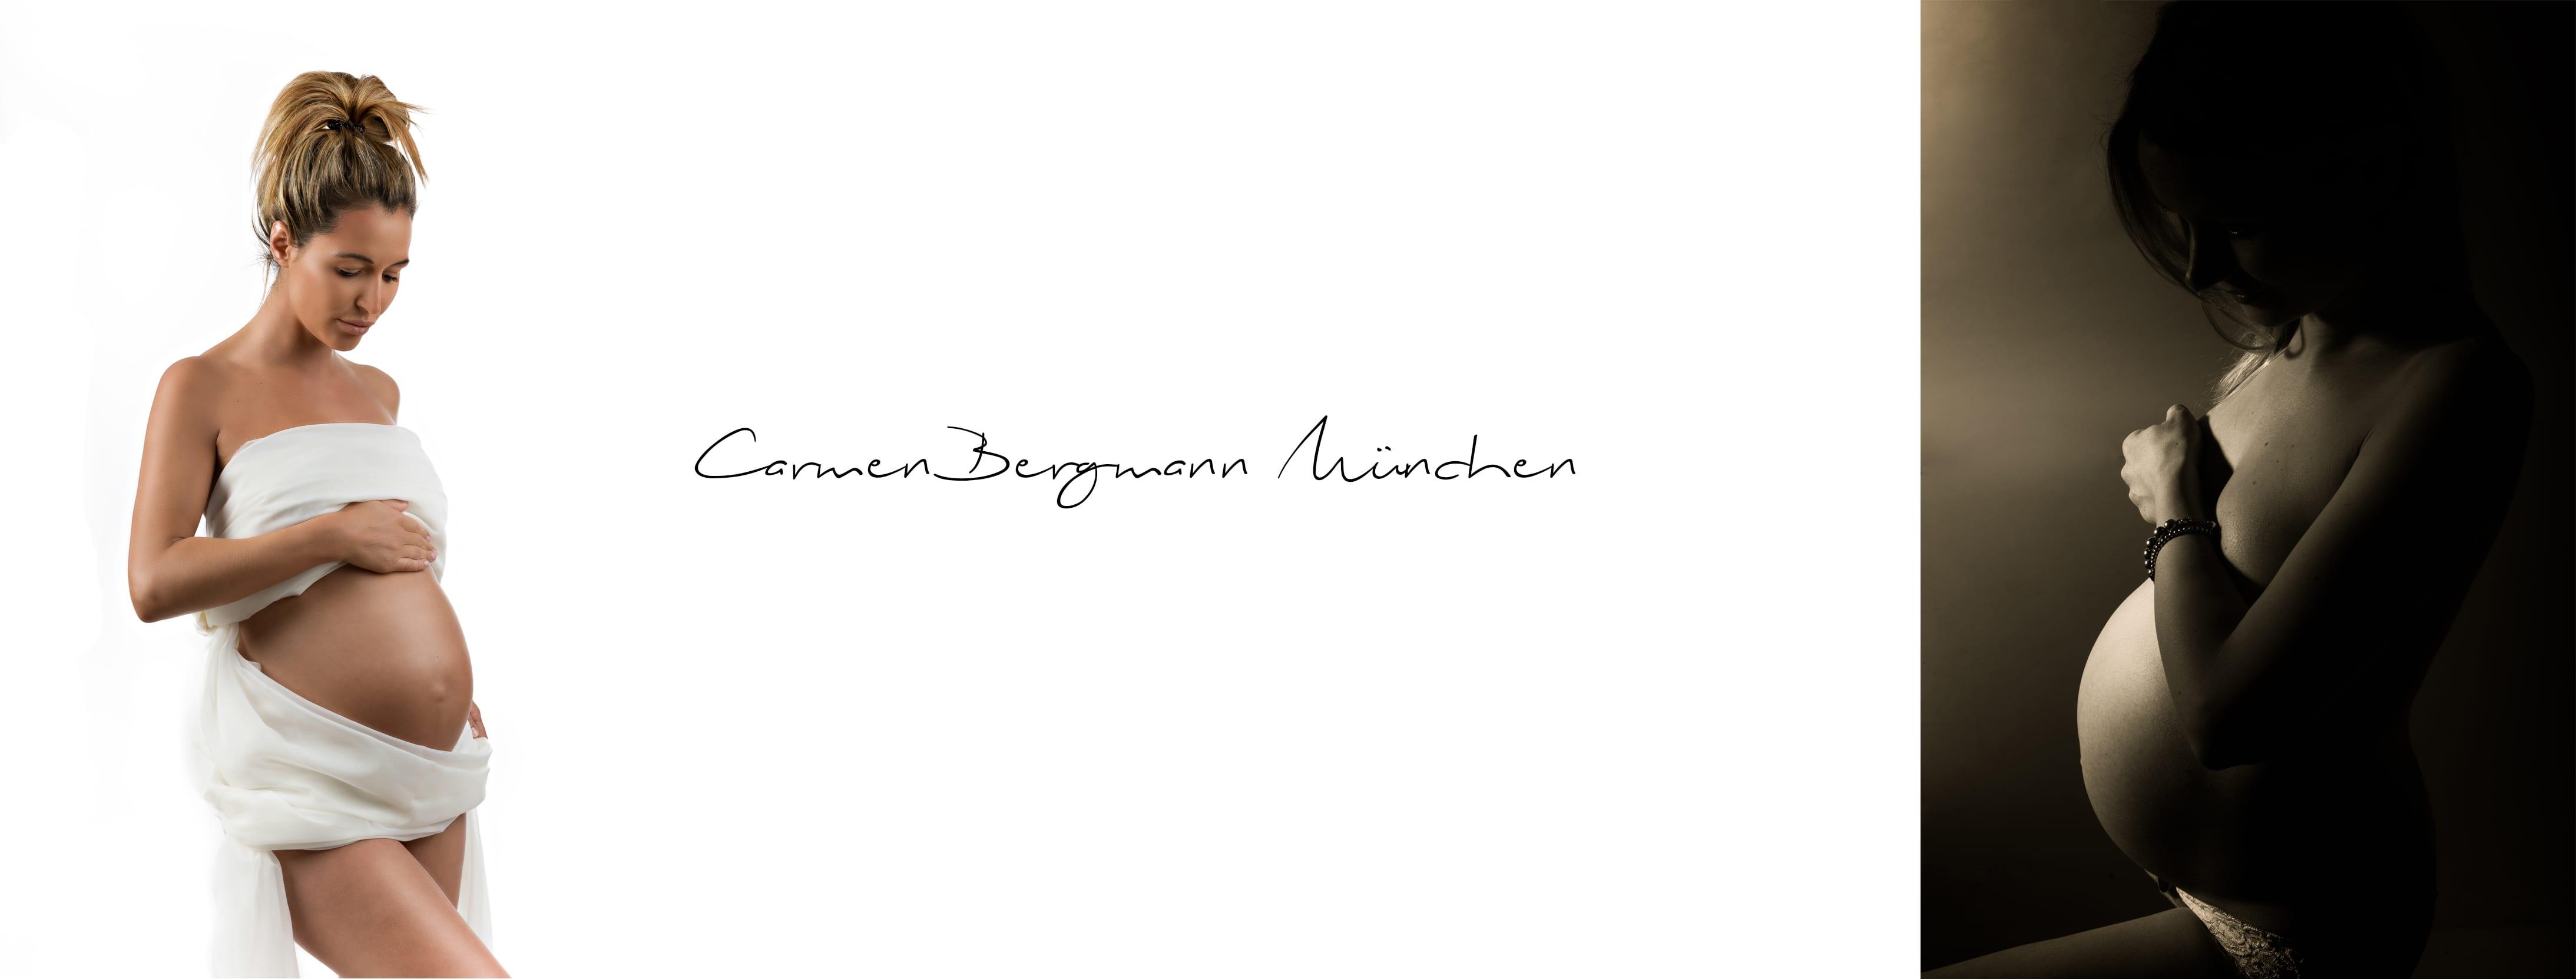 Bergmann Fotografin Muenchen Kirchenstraße 87 81675 Haidhausen München 08921543594 carmen@carmenbergmann.de